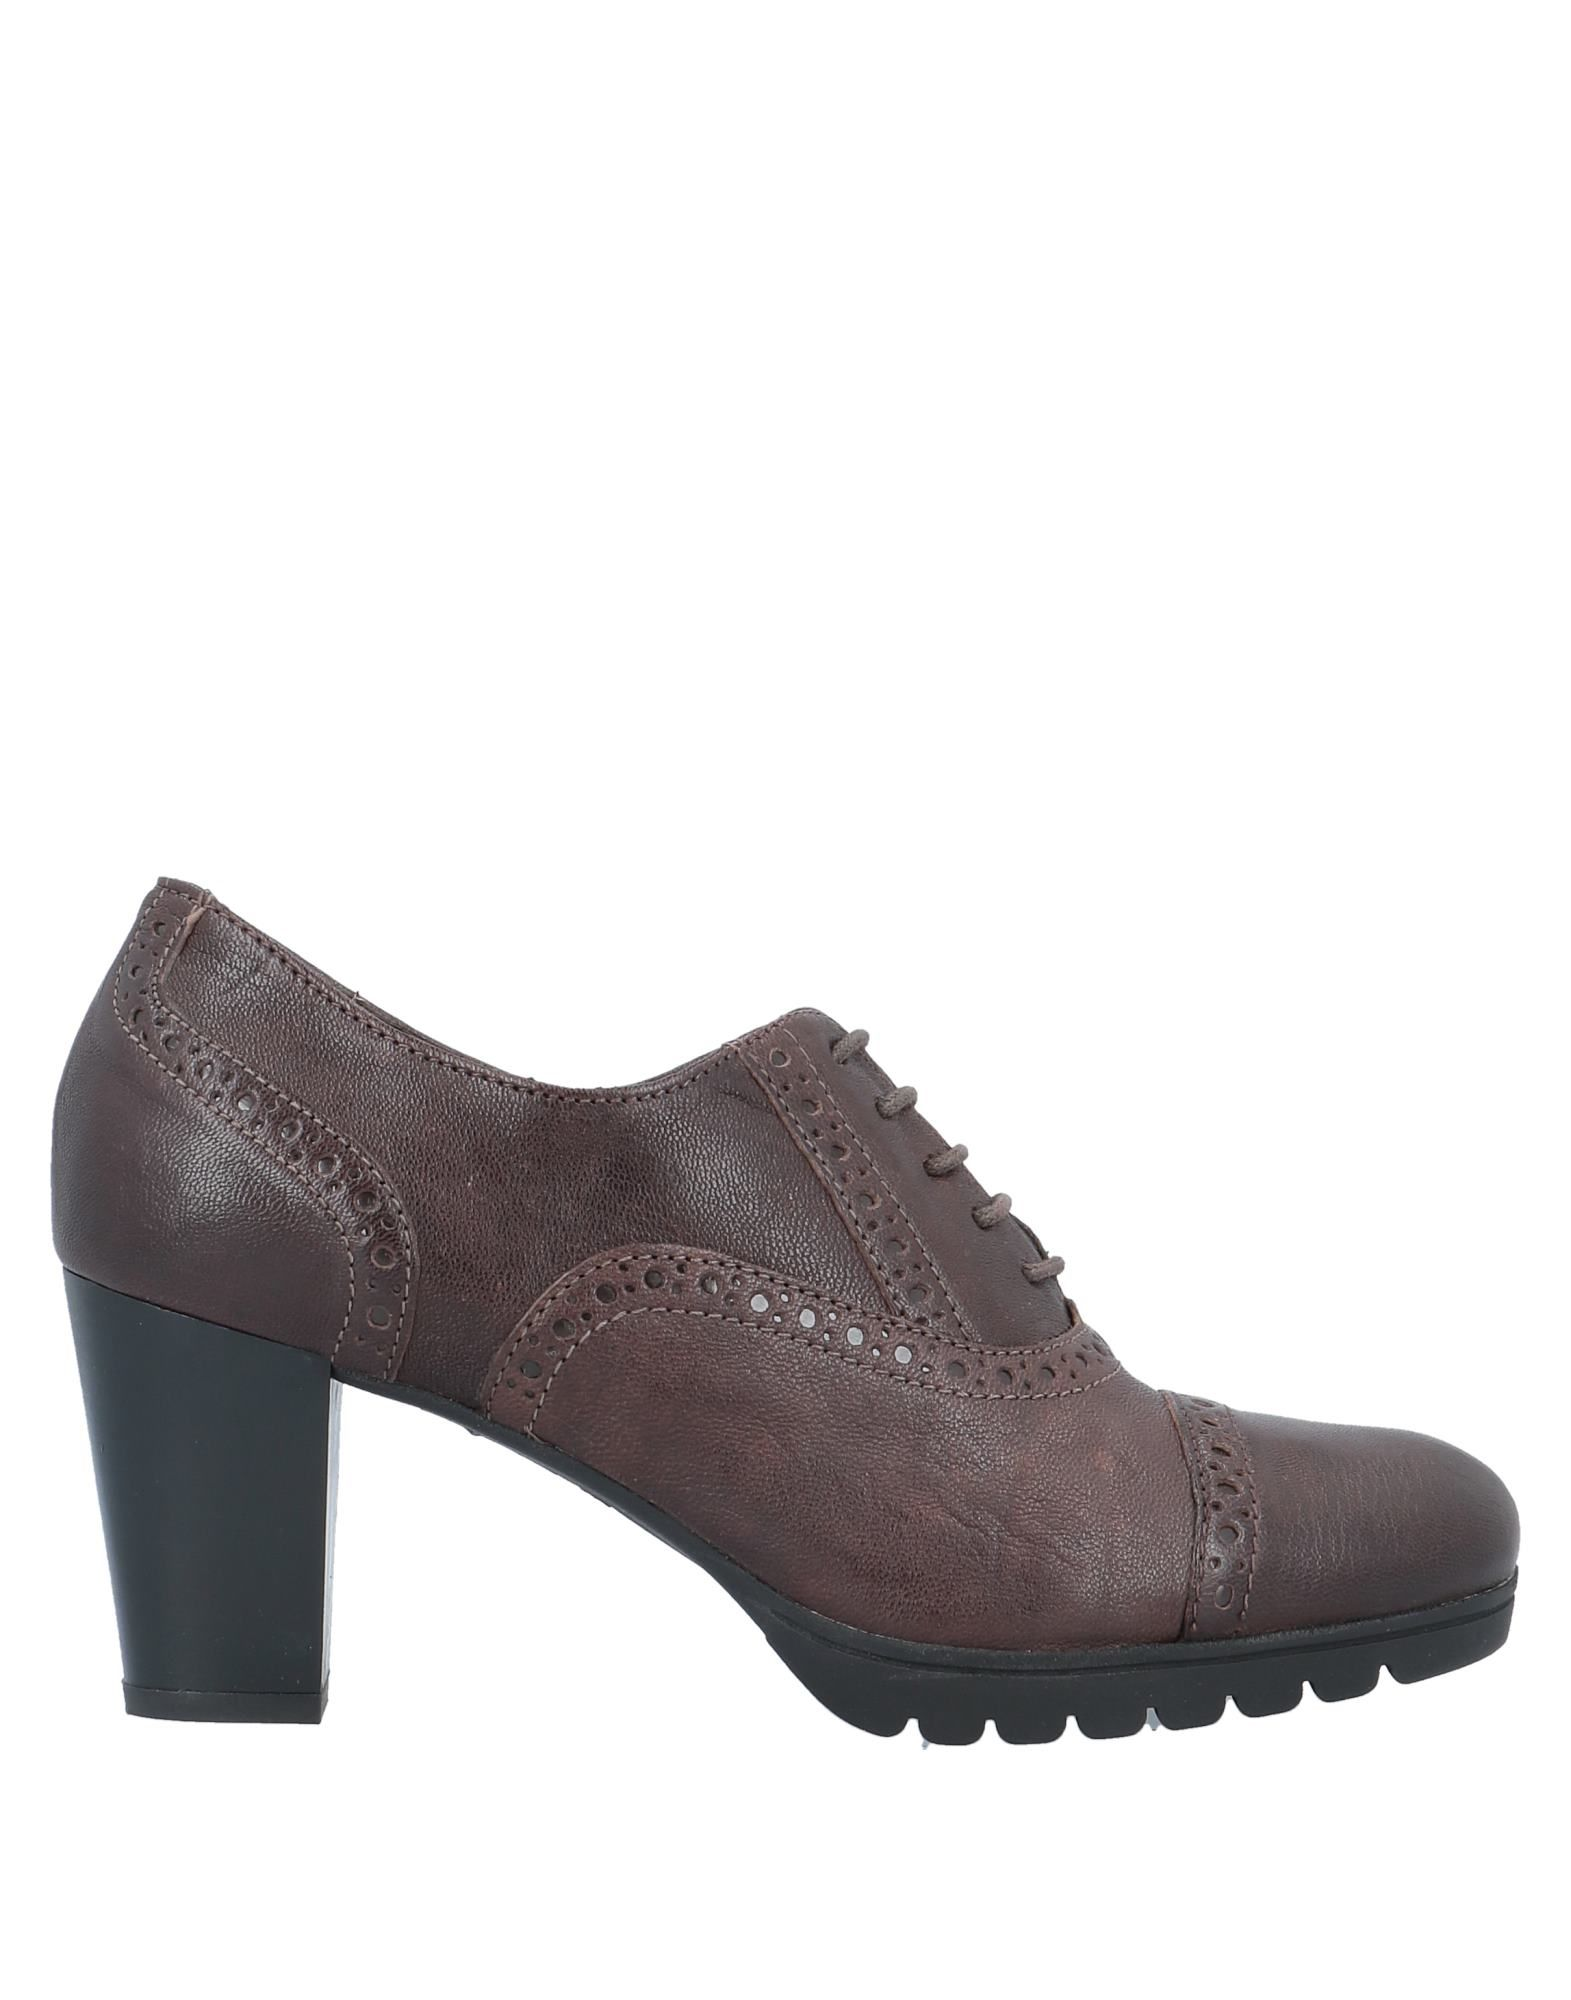 FLEX&FLY® by KEYS Обувь на шнурках claudia by isaberi обувь на шнурках